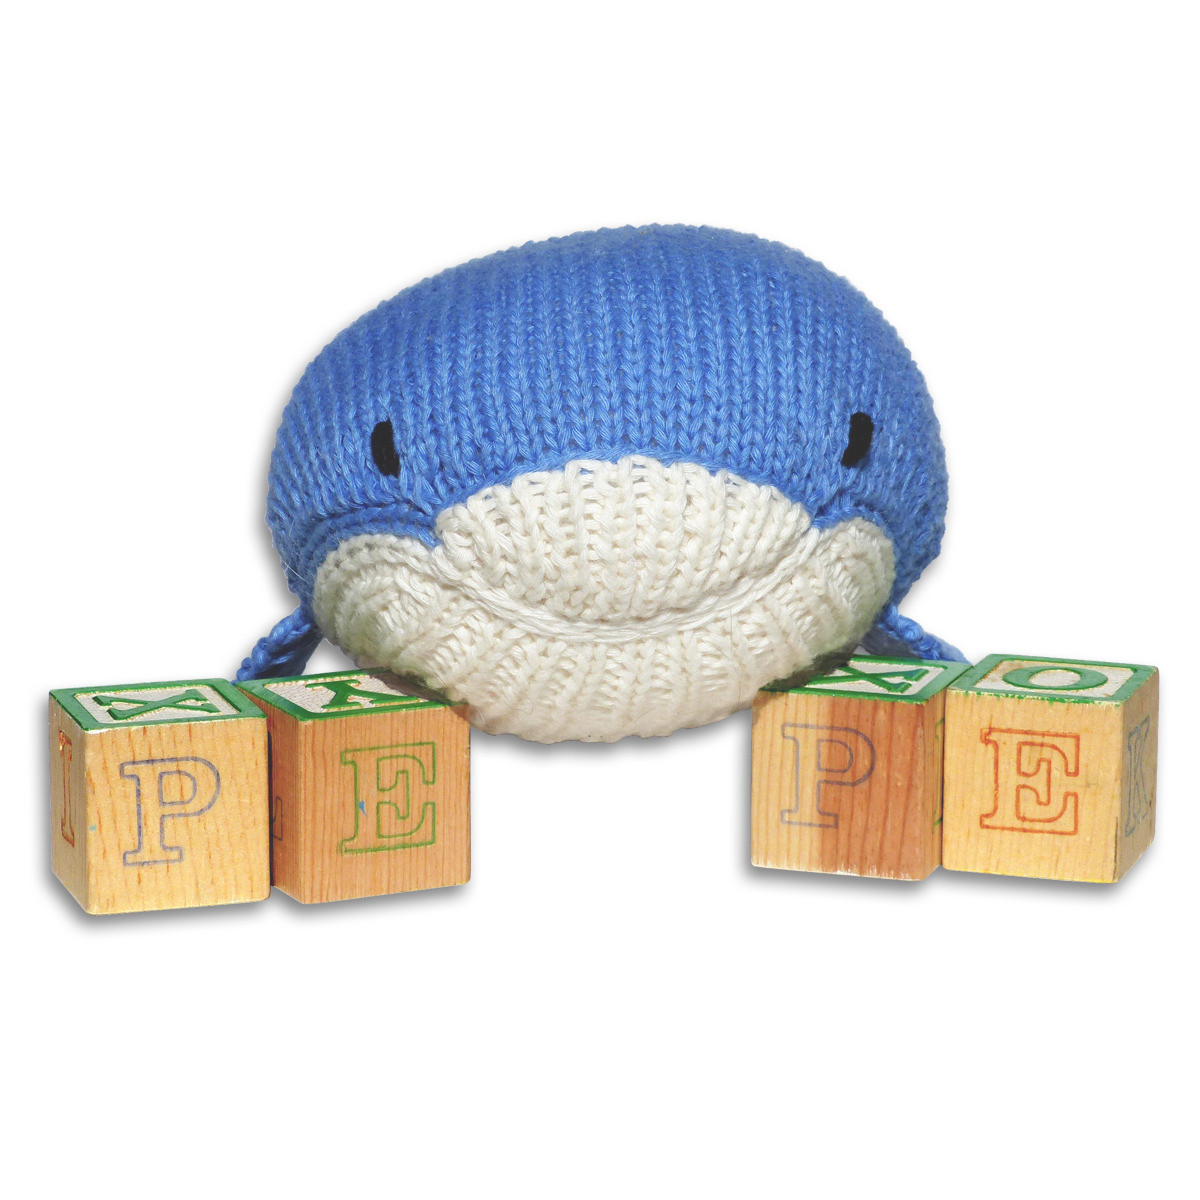 Chill n Feel - Bio Kuscheltier Wal aus Fairem Handel (1)